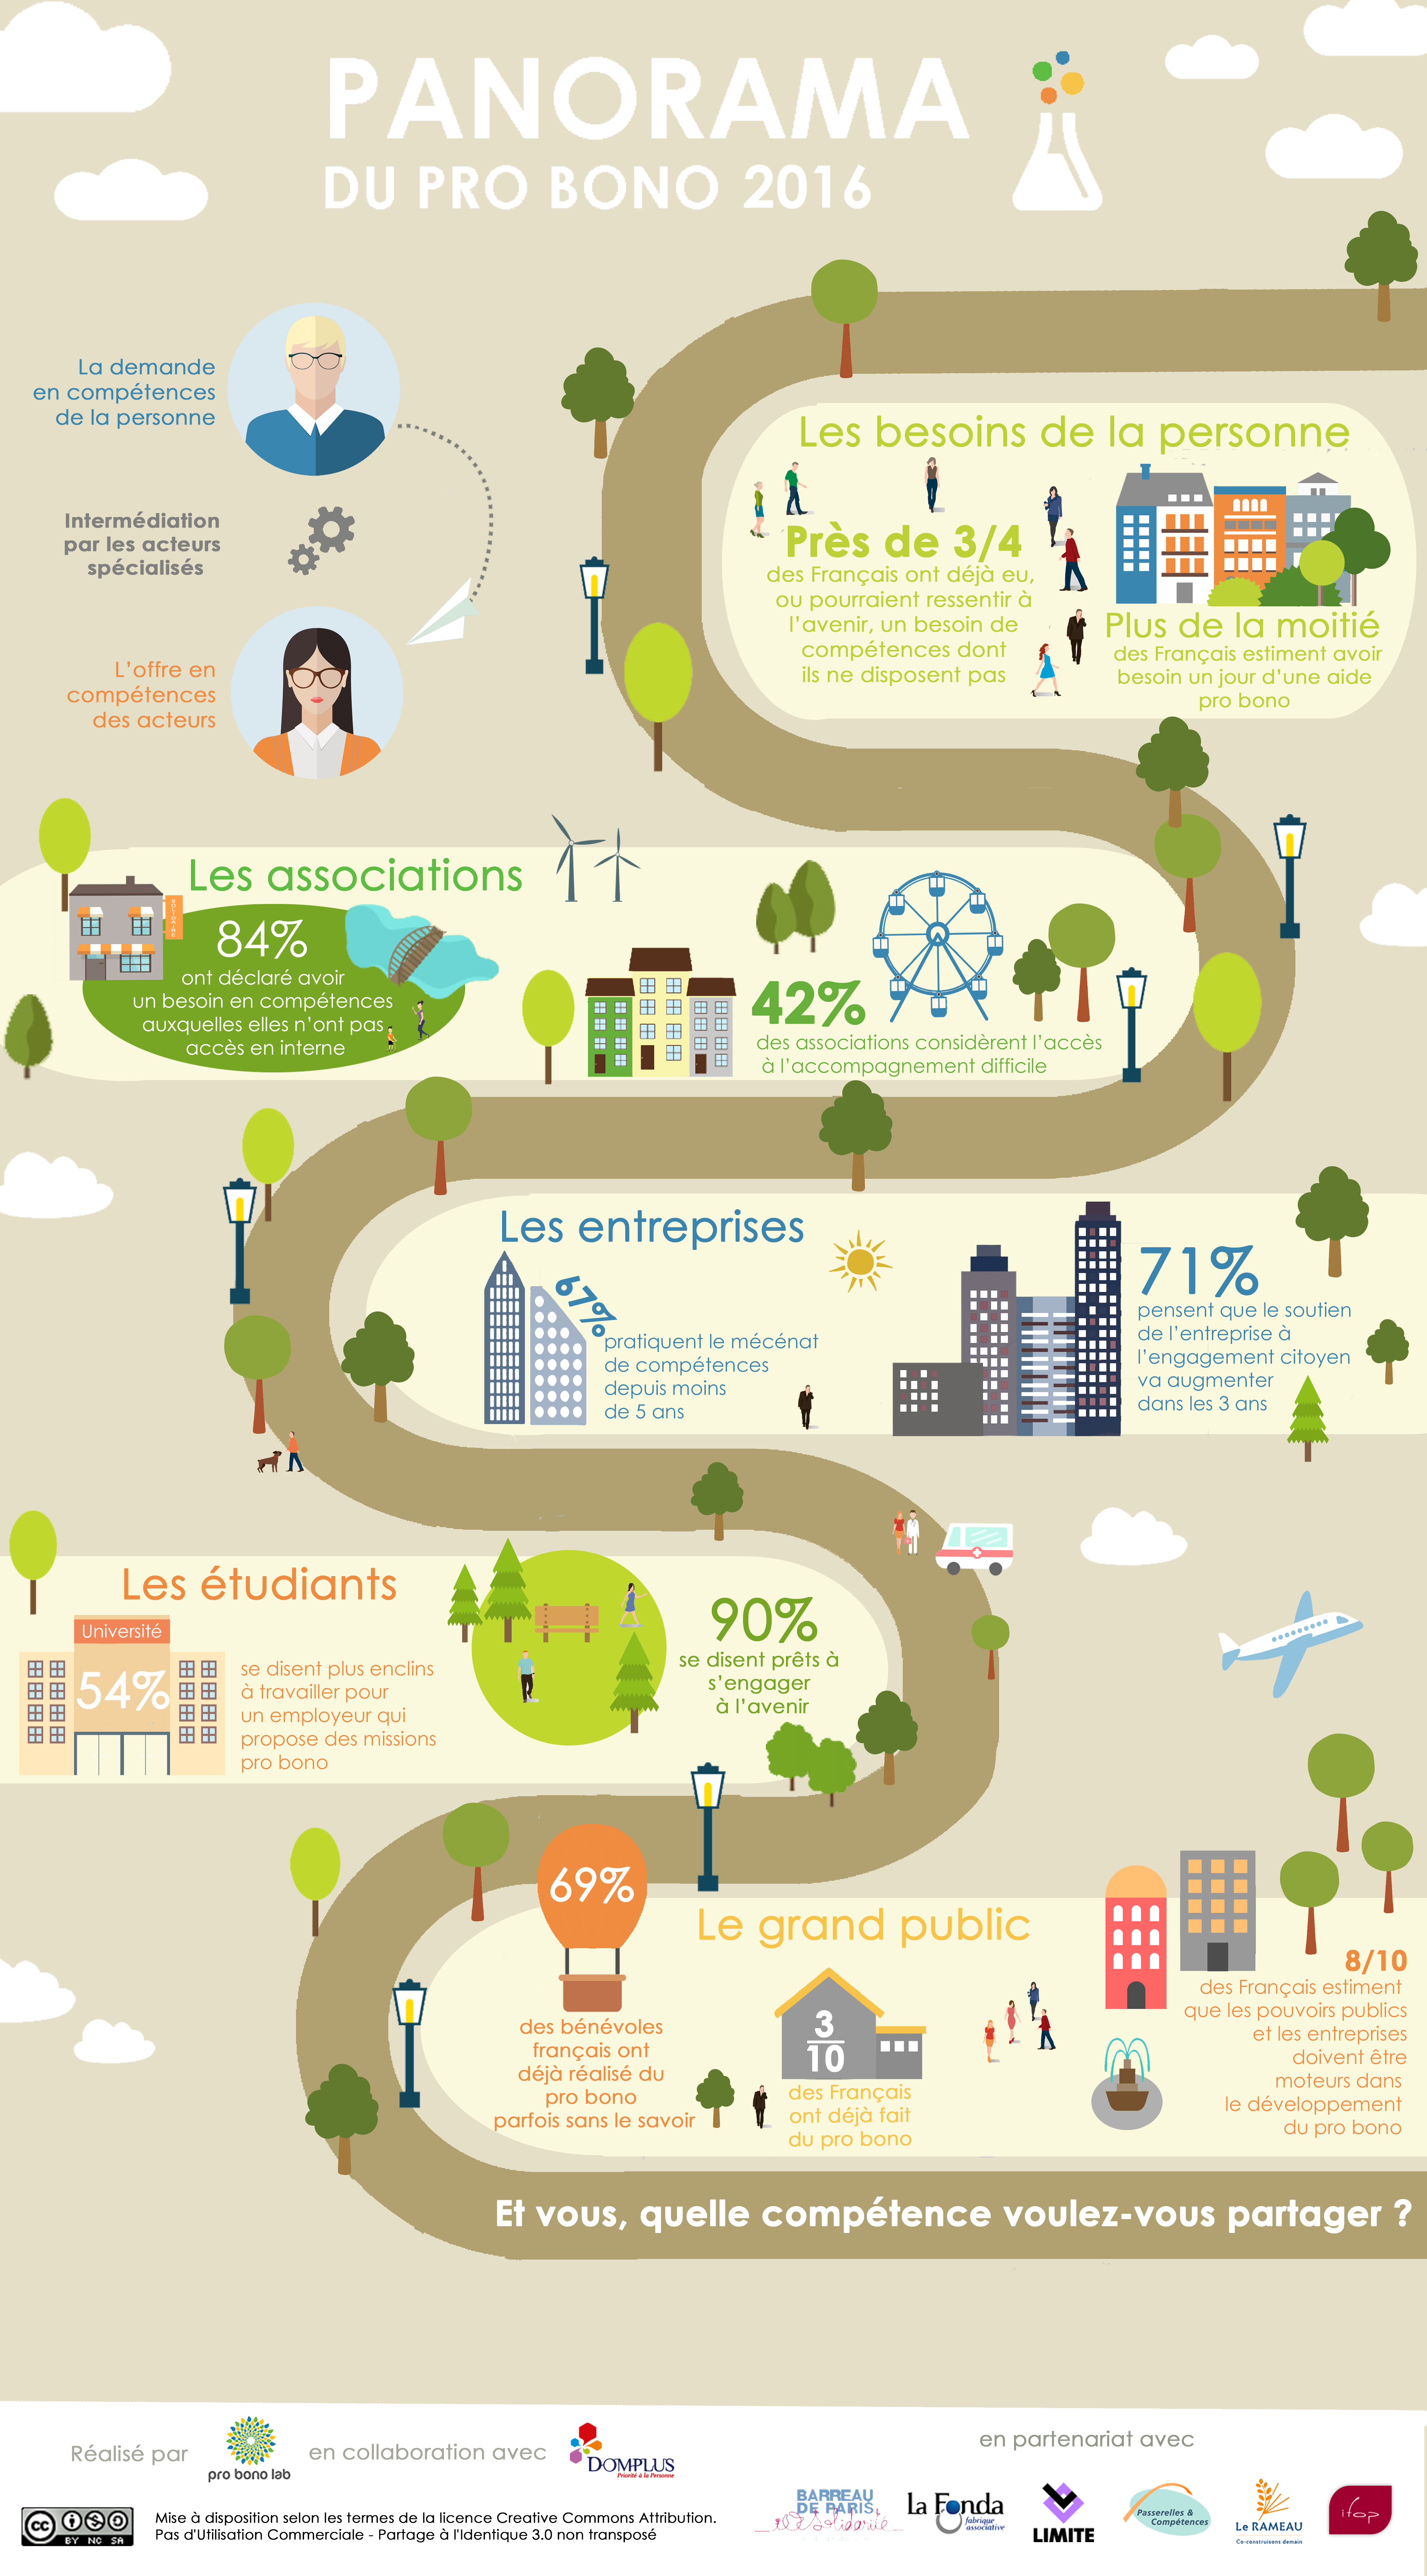 Panorama_du_pro_bono_2016_Infographie